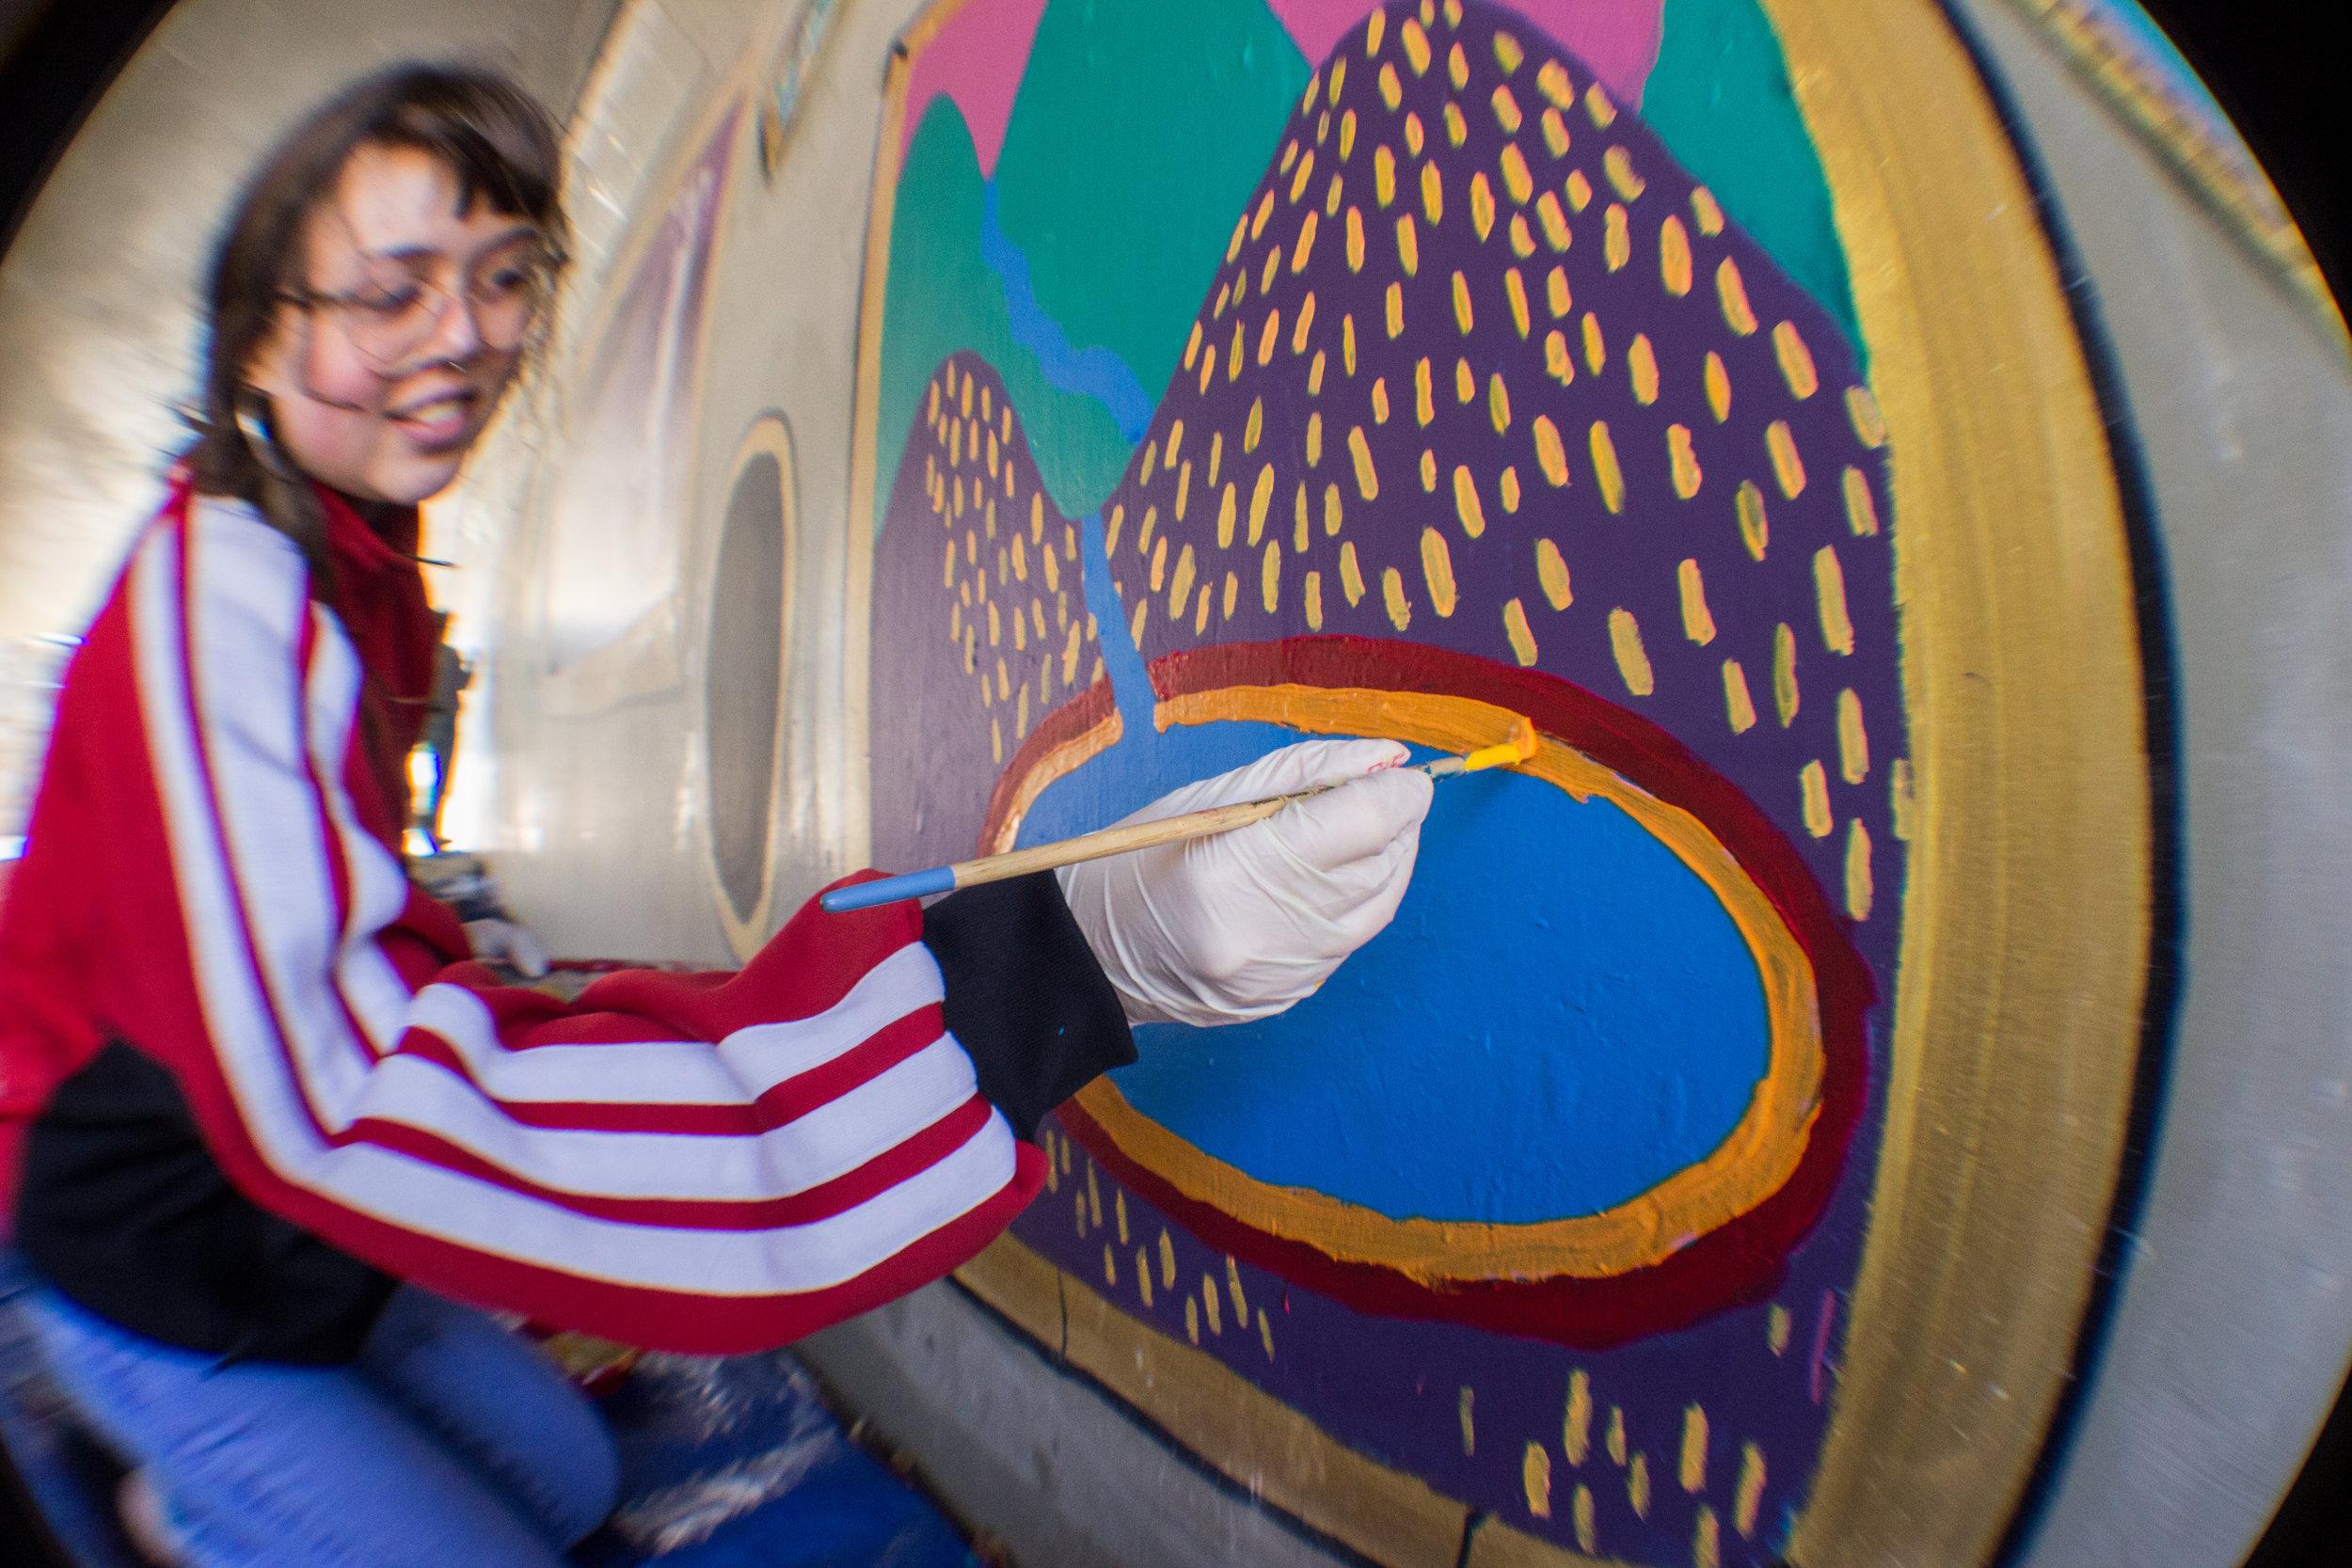 Arts Martin Acres murals 4.11.18-34.jpg